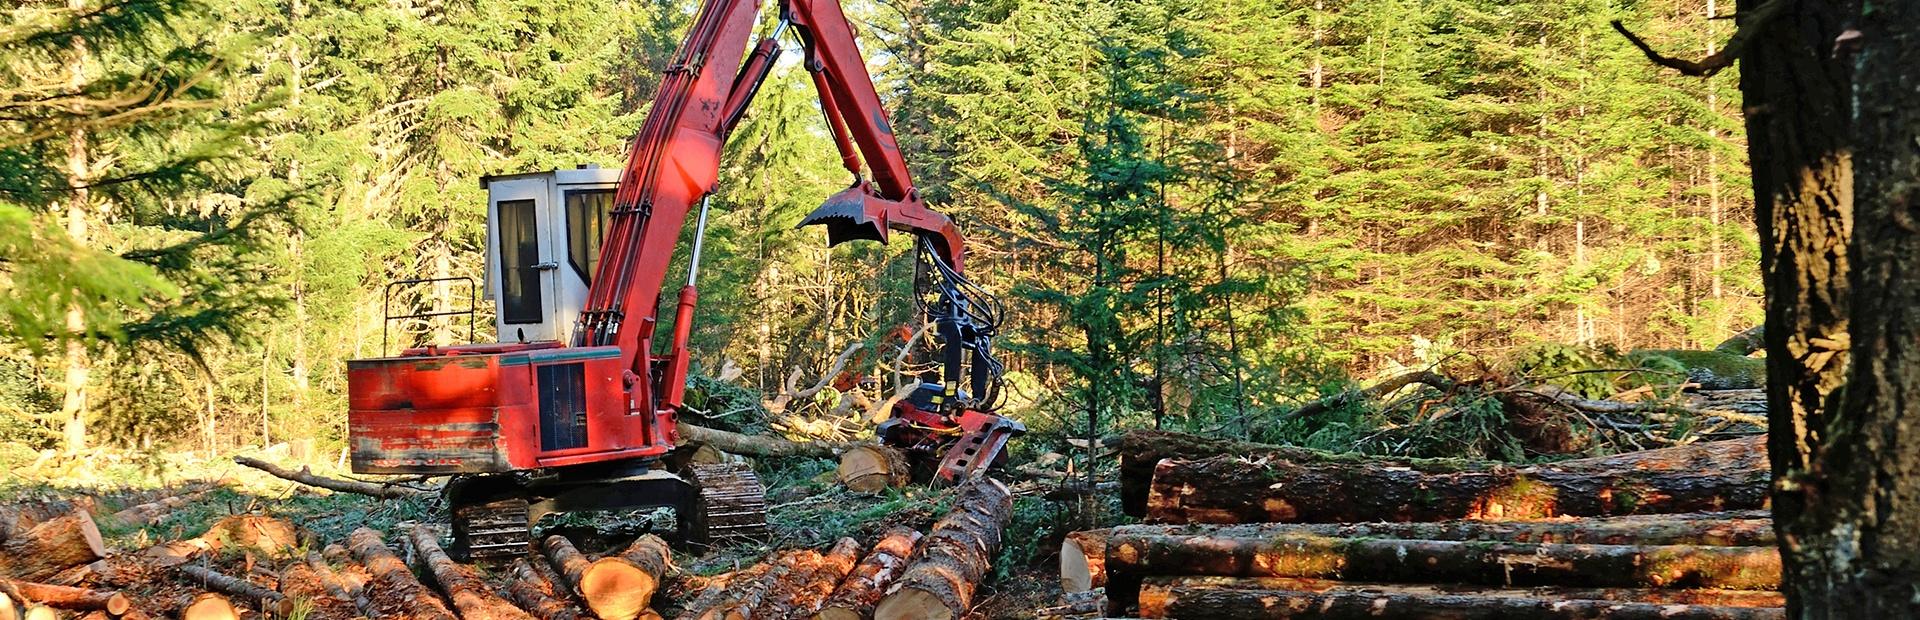 Slider_Repurpose_Wood_Cleared_from_Acreage.jpg